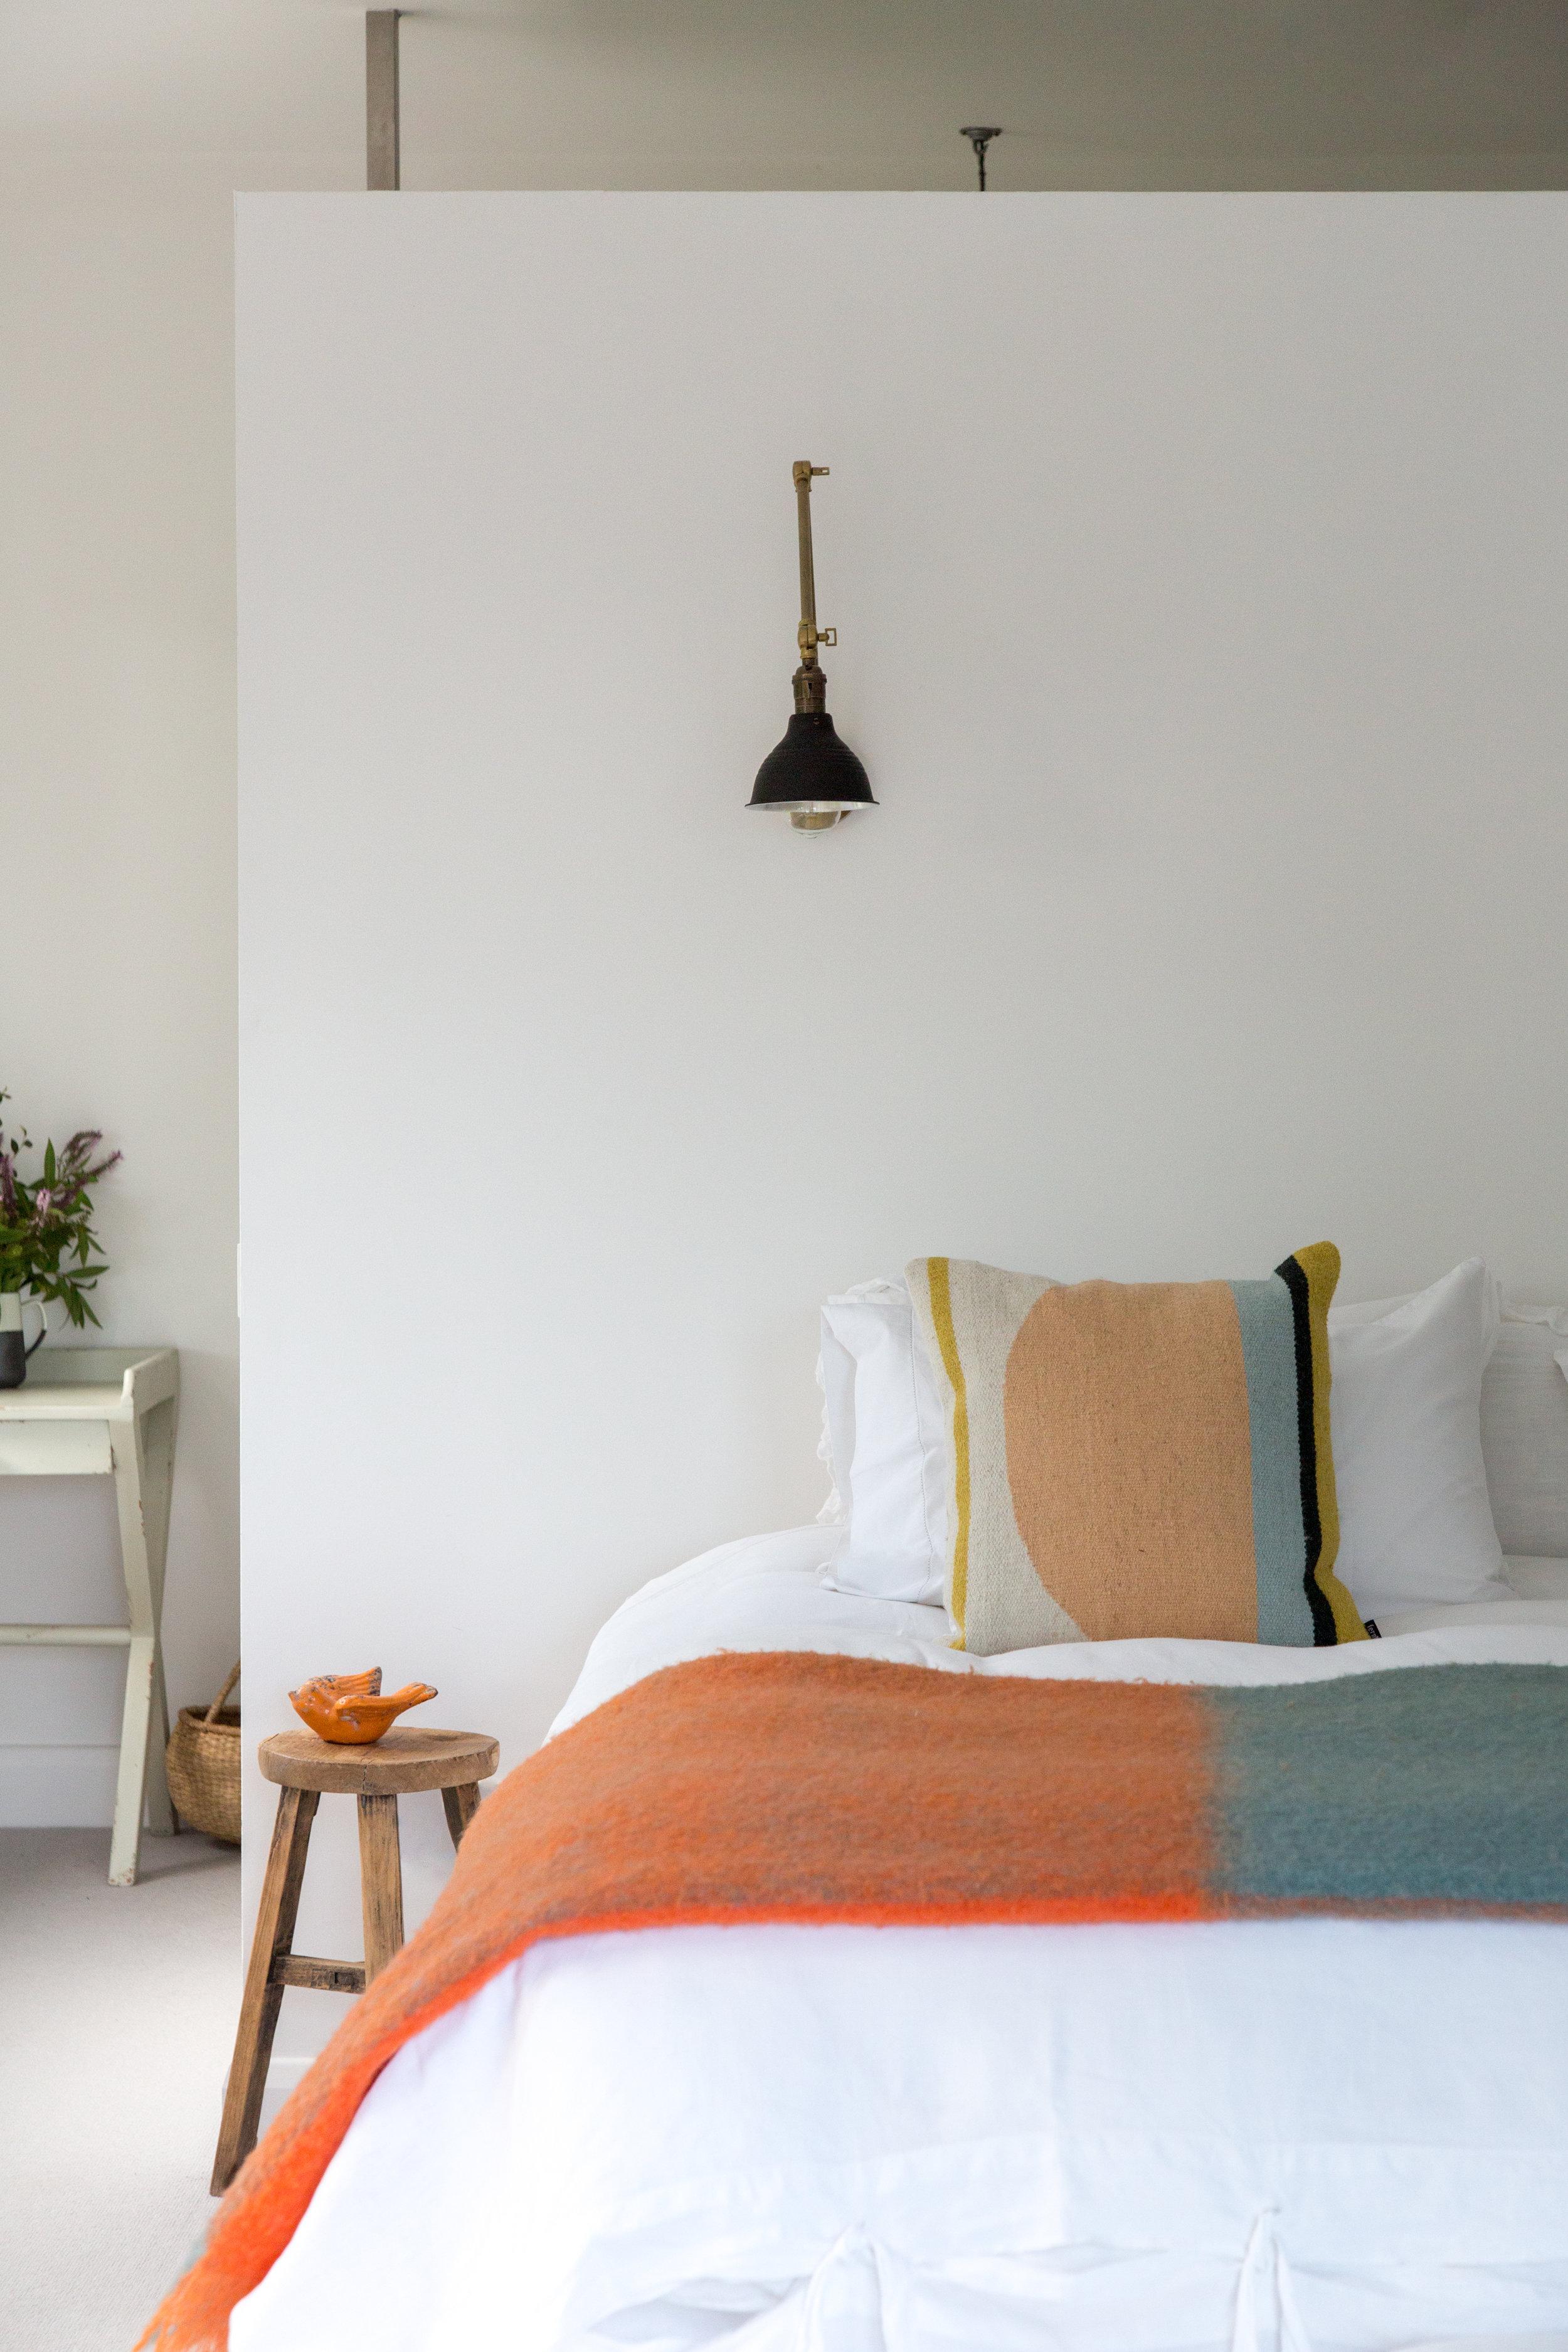 Lamb_Design_Paper_and_Moon_Emma_Lynch_Louise_Dockery_Scandi_French_Danish_homeware_Irish_business_interior_designer_floating_wall.jpg